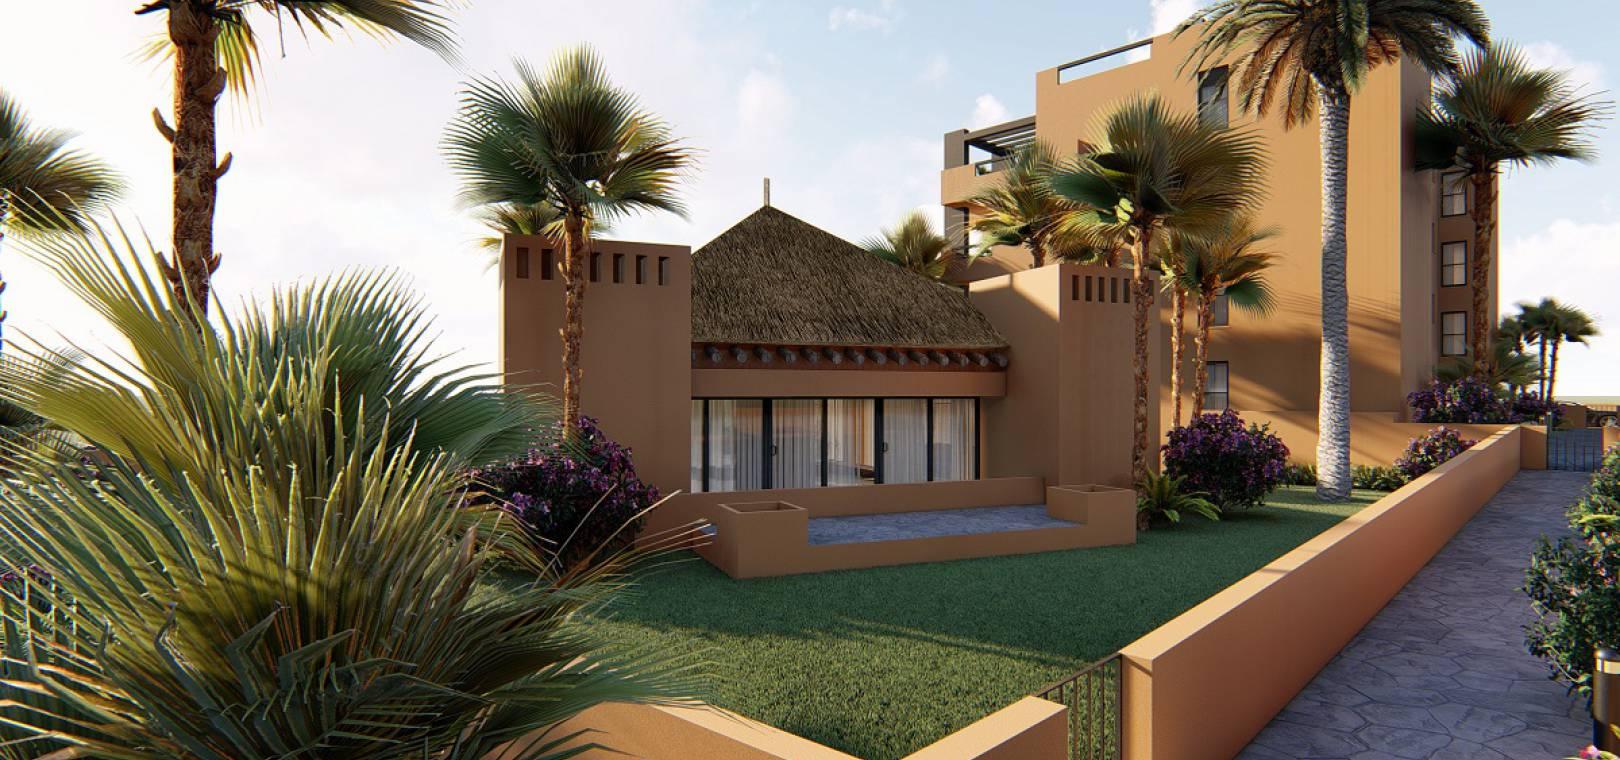 Palapa_Golf_Villamartin_New_Build_Properties_For_Sale_4